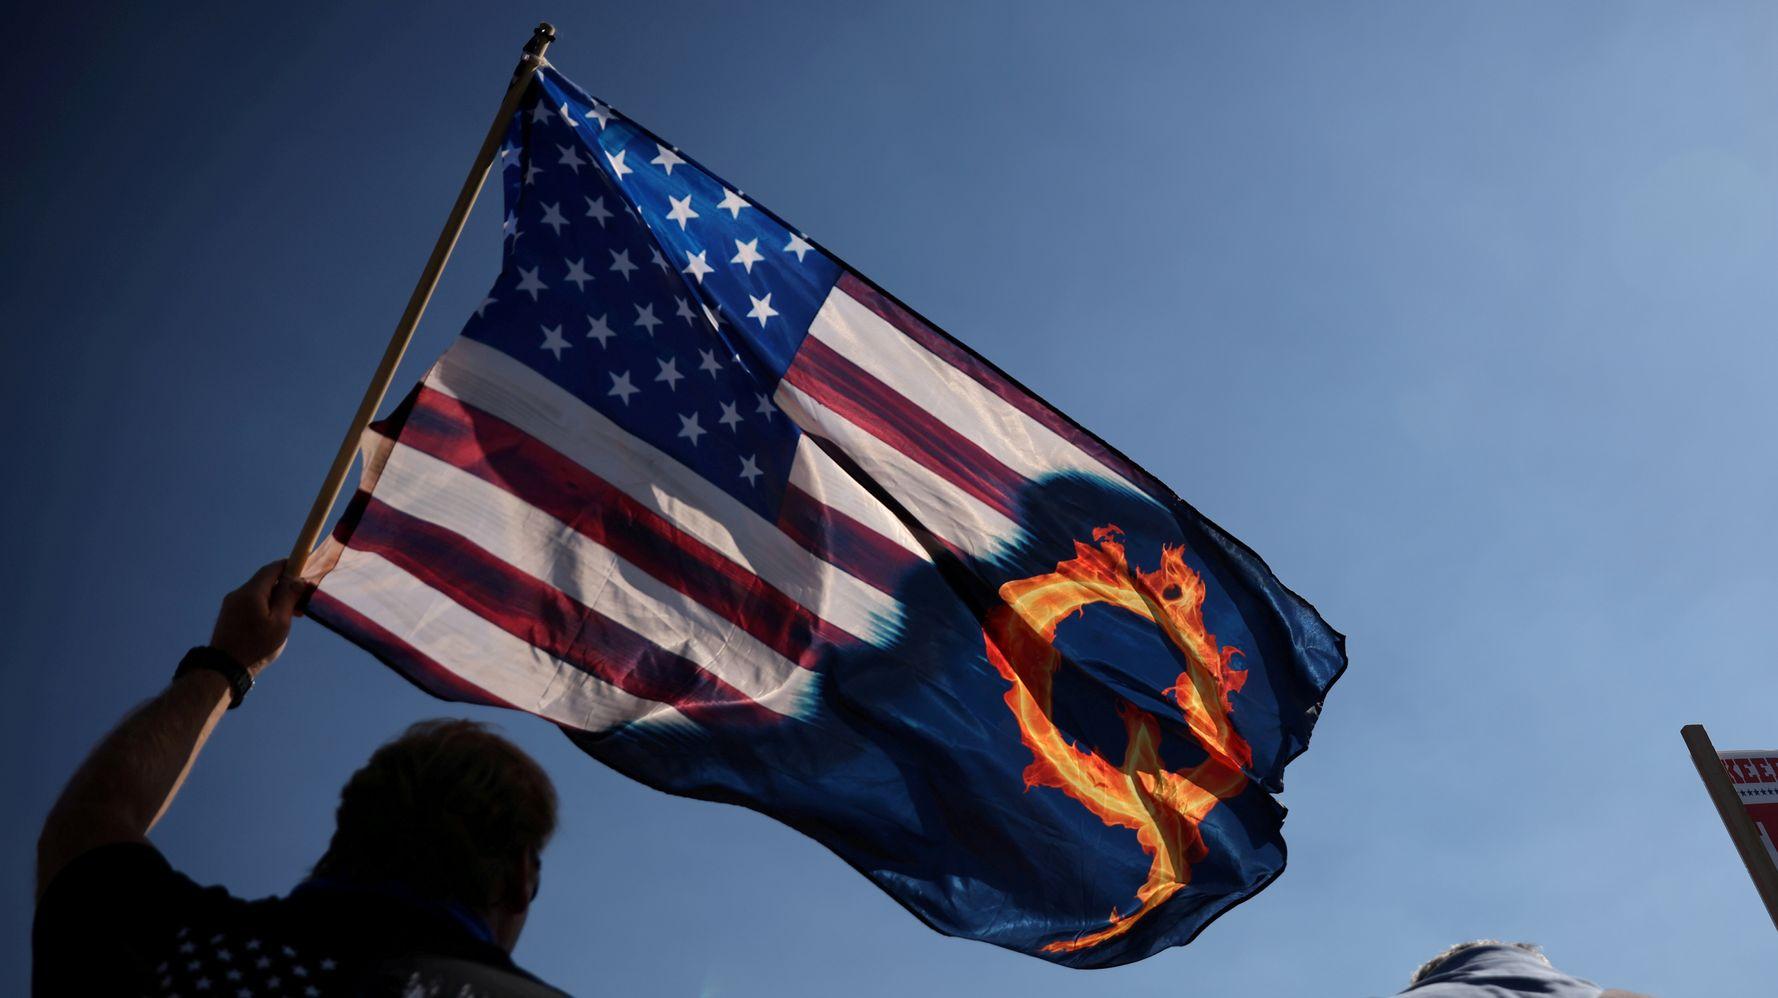 'It's Over': Devastated QAnon Believers Grapple With President Joe Biden's Inauguration